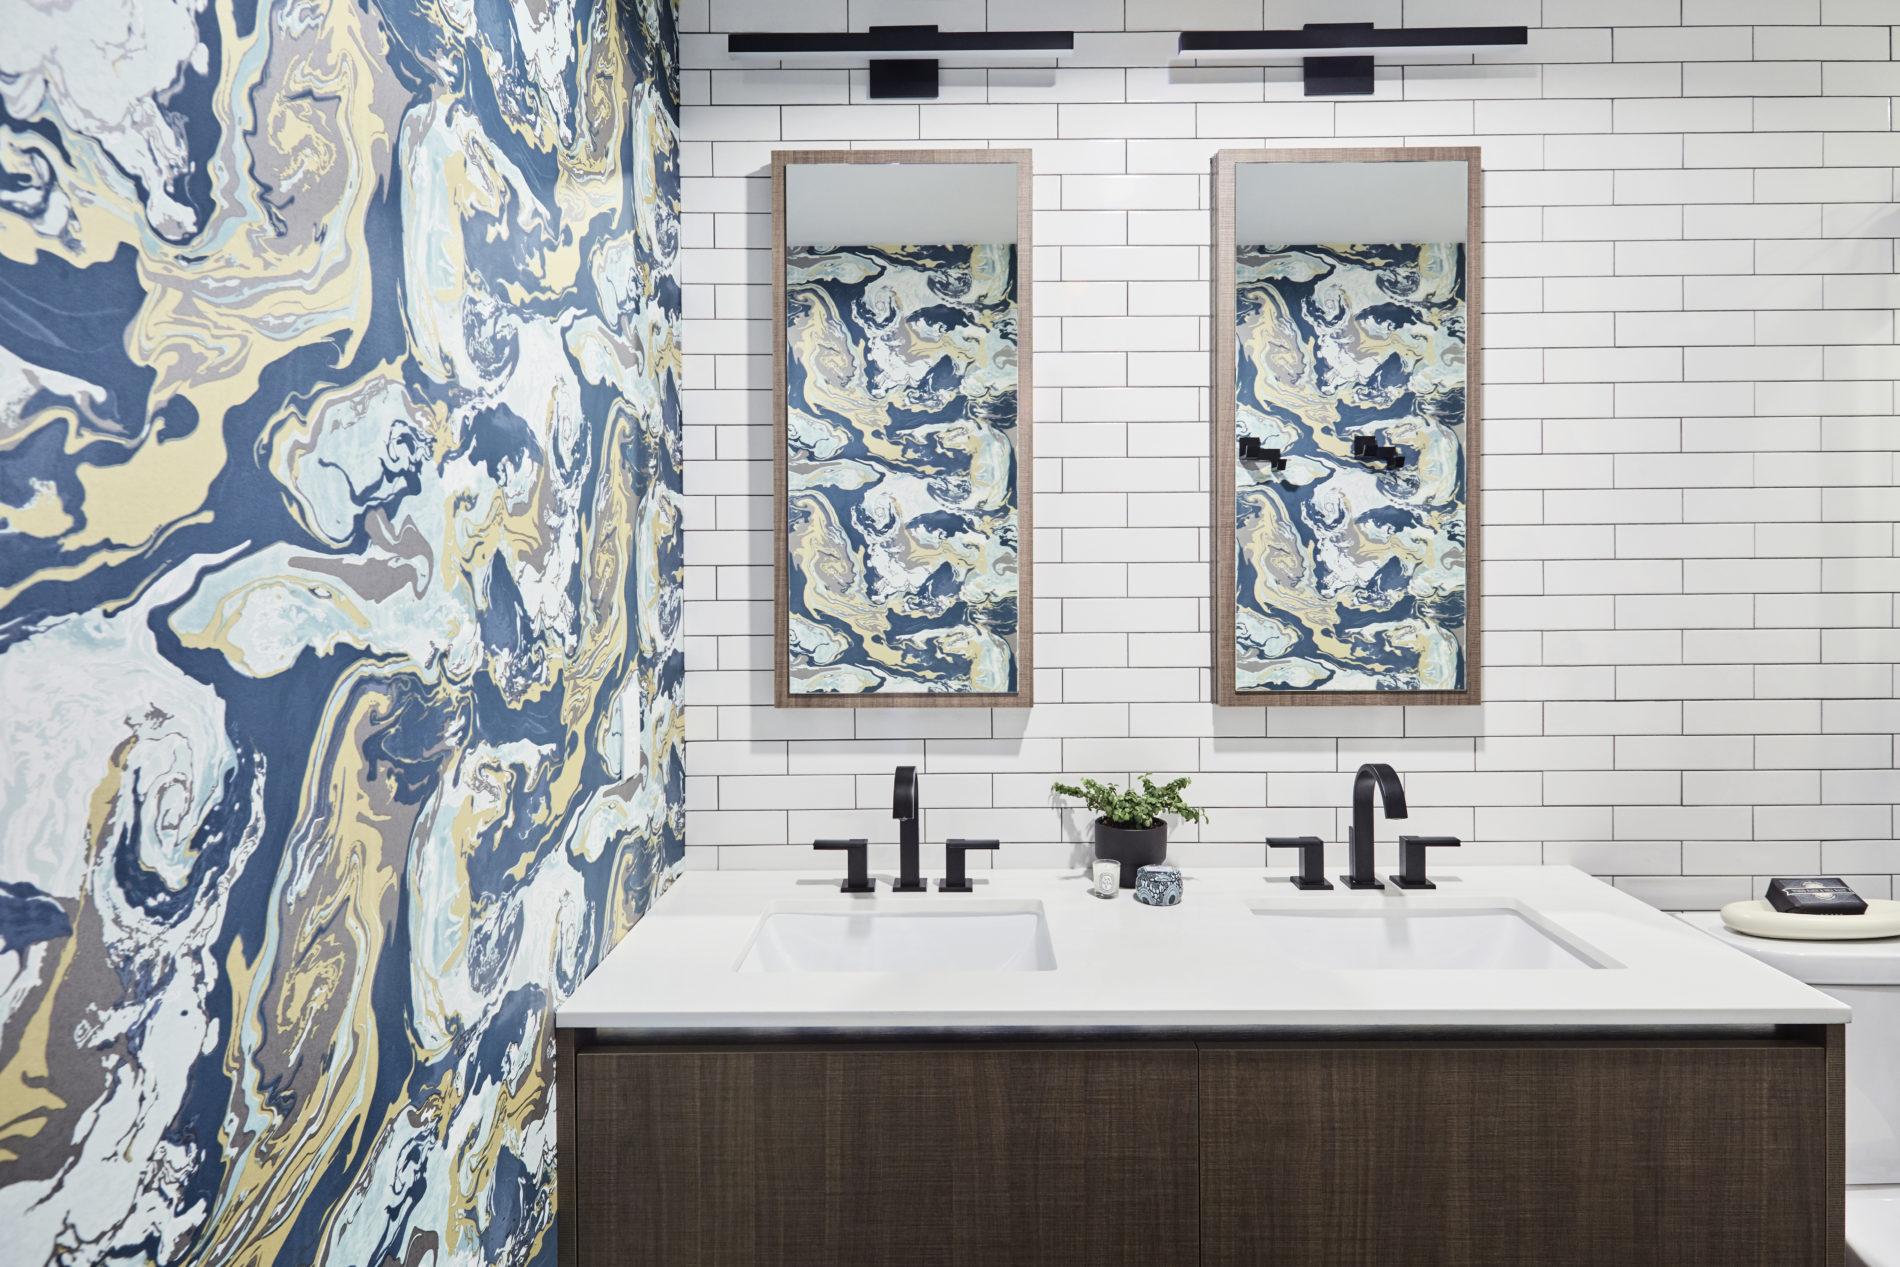 Downtown Toronto Condo Ensuite Bathroom - Featured Image